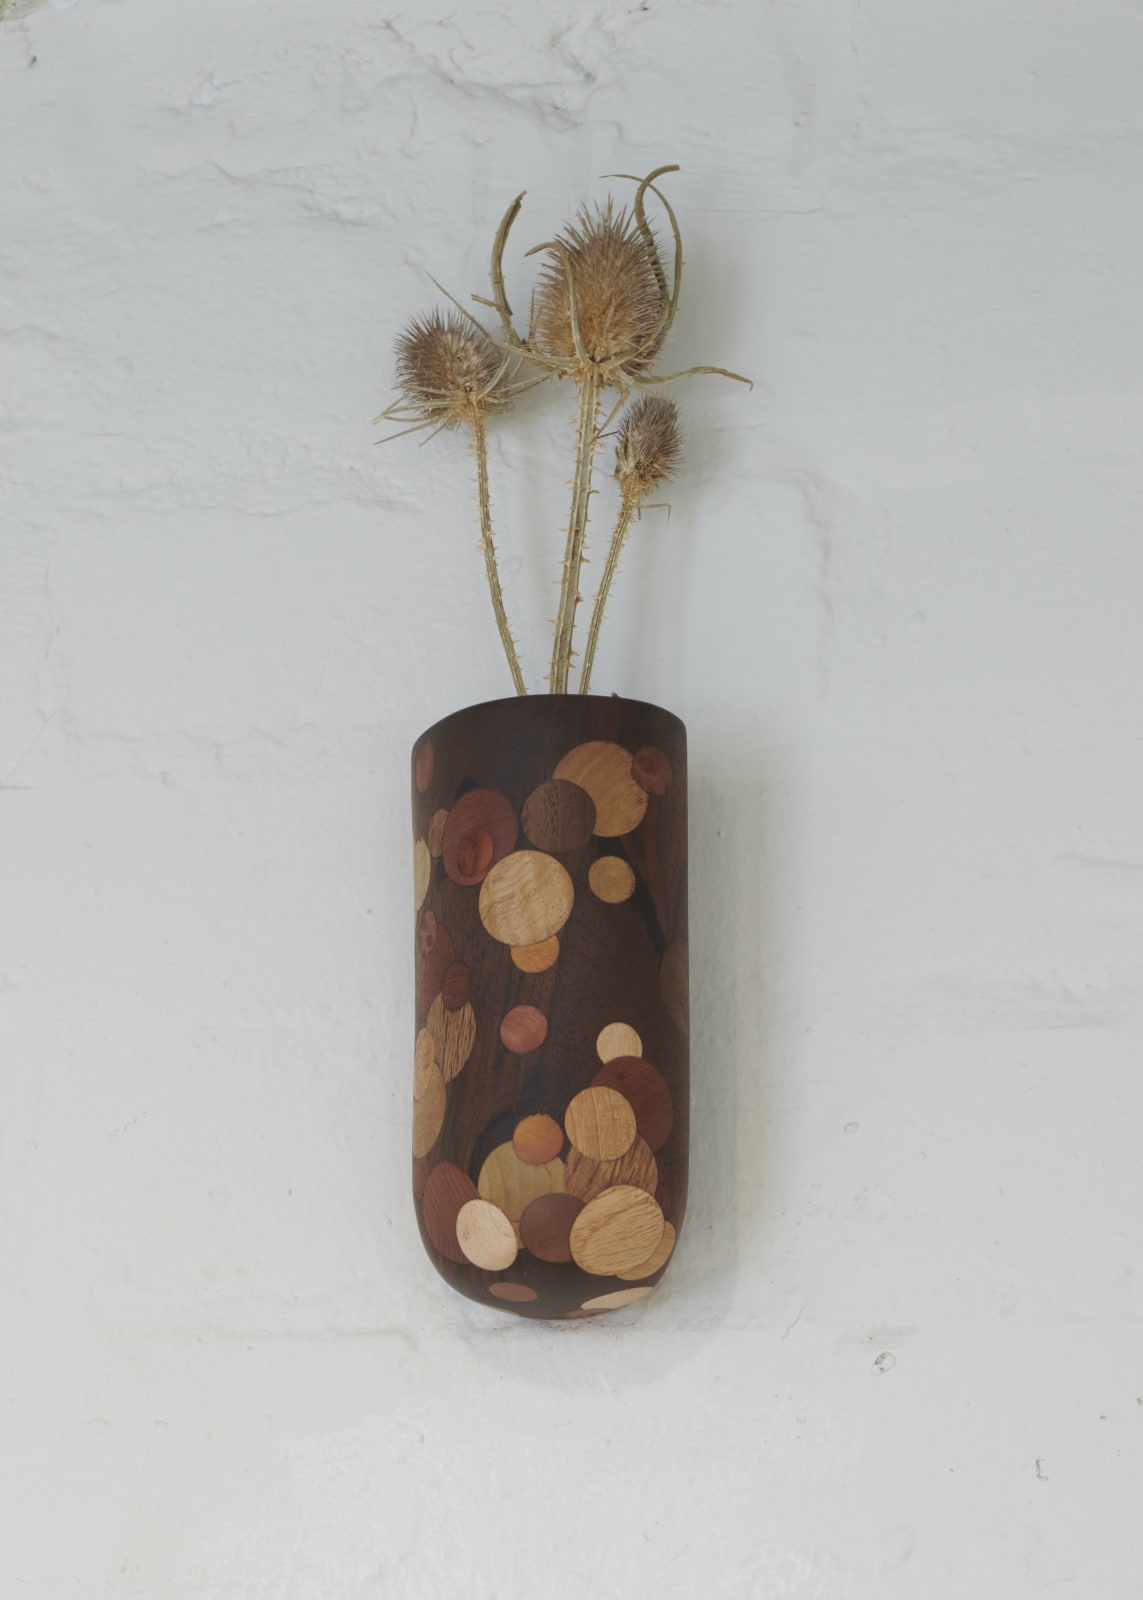 Plug Series, 2020 Klaro Walnut, Eucalyptus, burly Redwood, Bay Lorel, Poplar, Pear, Redwood, Plum, Maple, WOM (wood of mystery), Mahogany, Elm, Oak (The wood is from the Blunk property in CA)